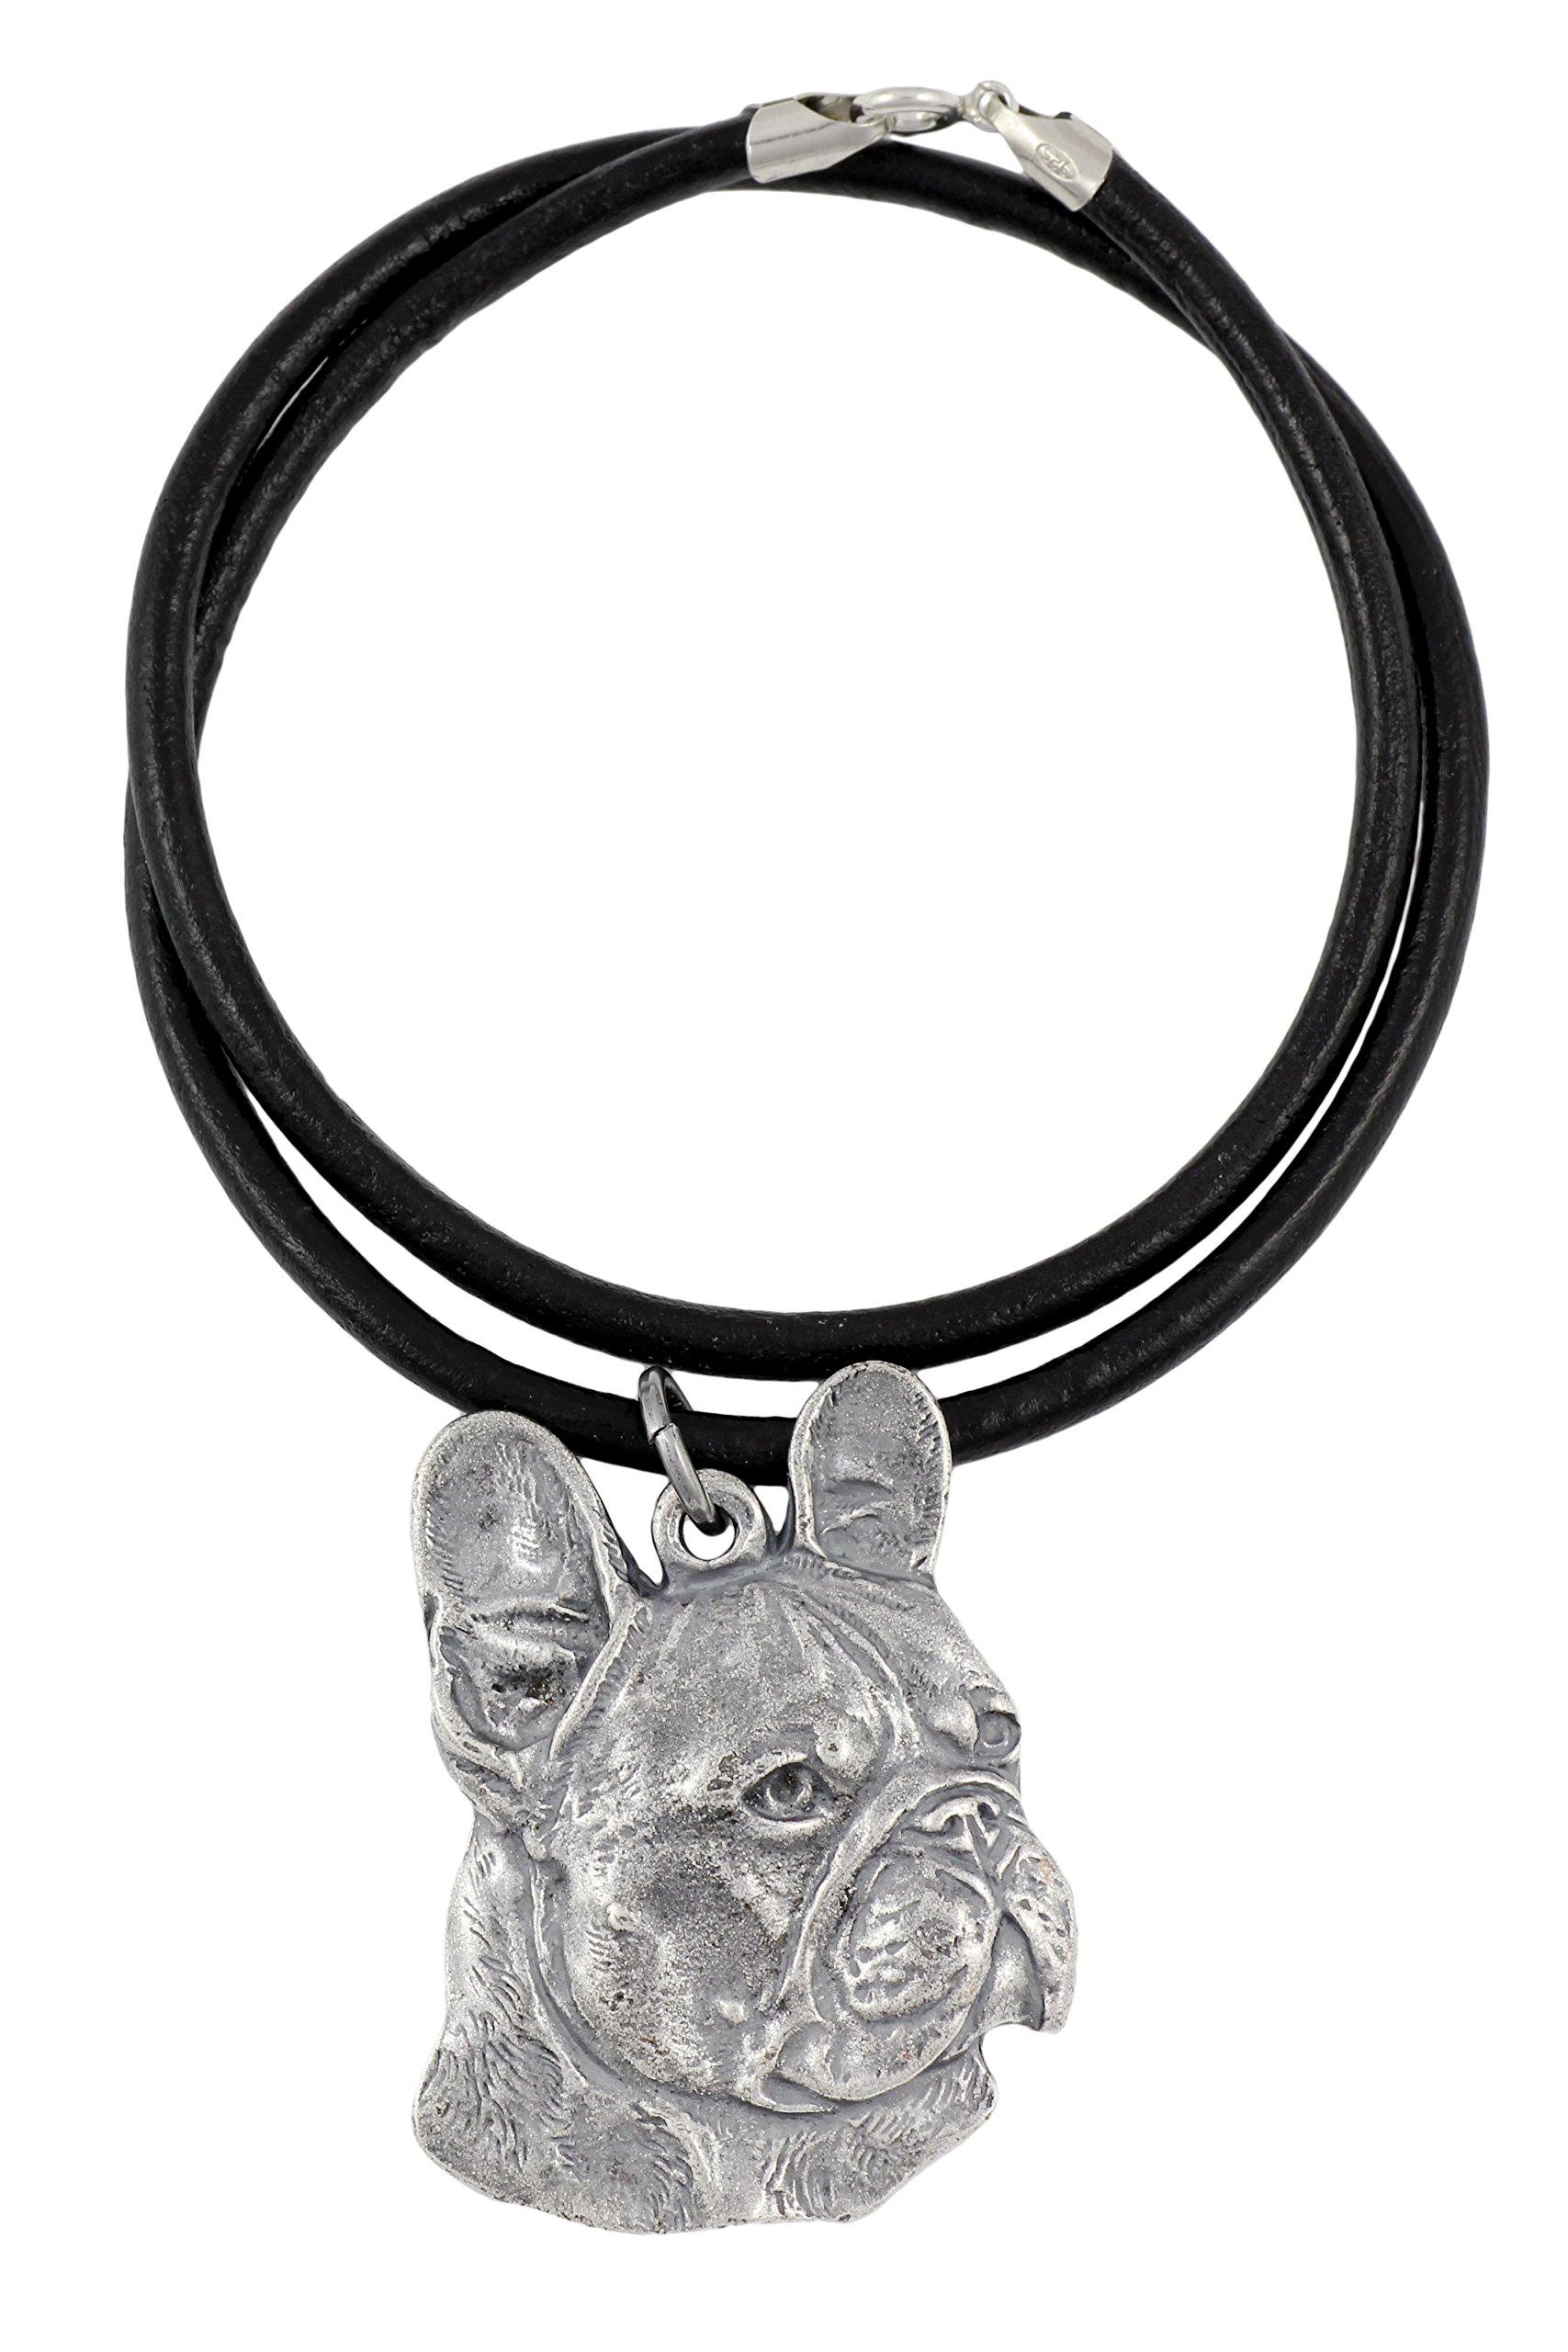 French Bulldog (Right-oriented) , Silver Hallmark 925, Dog Silver Necklaces, Limited Edition, Artdog